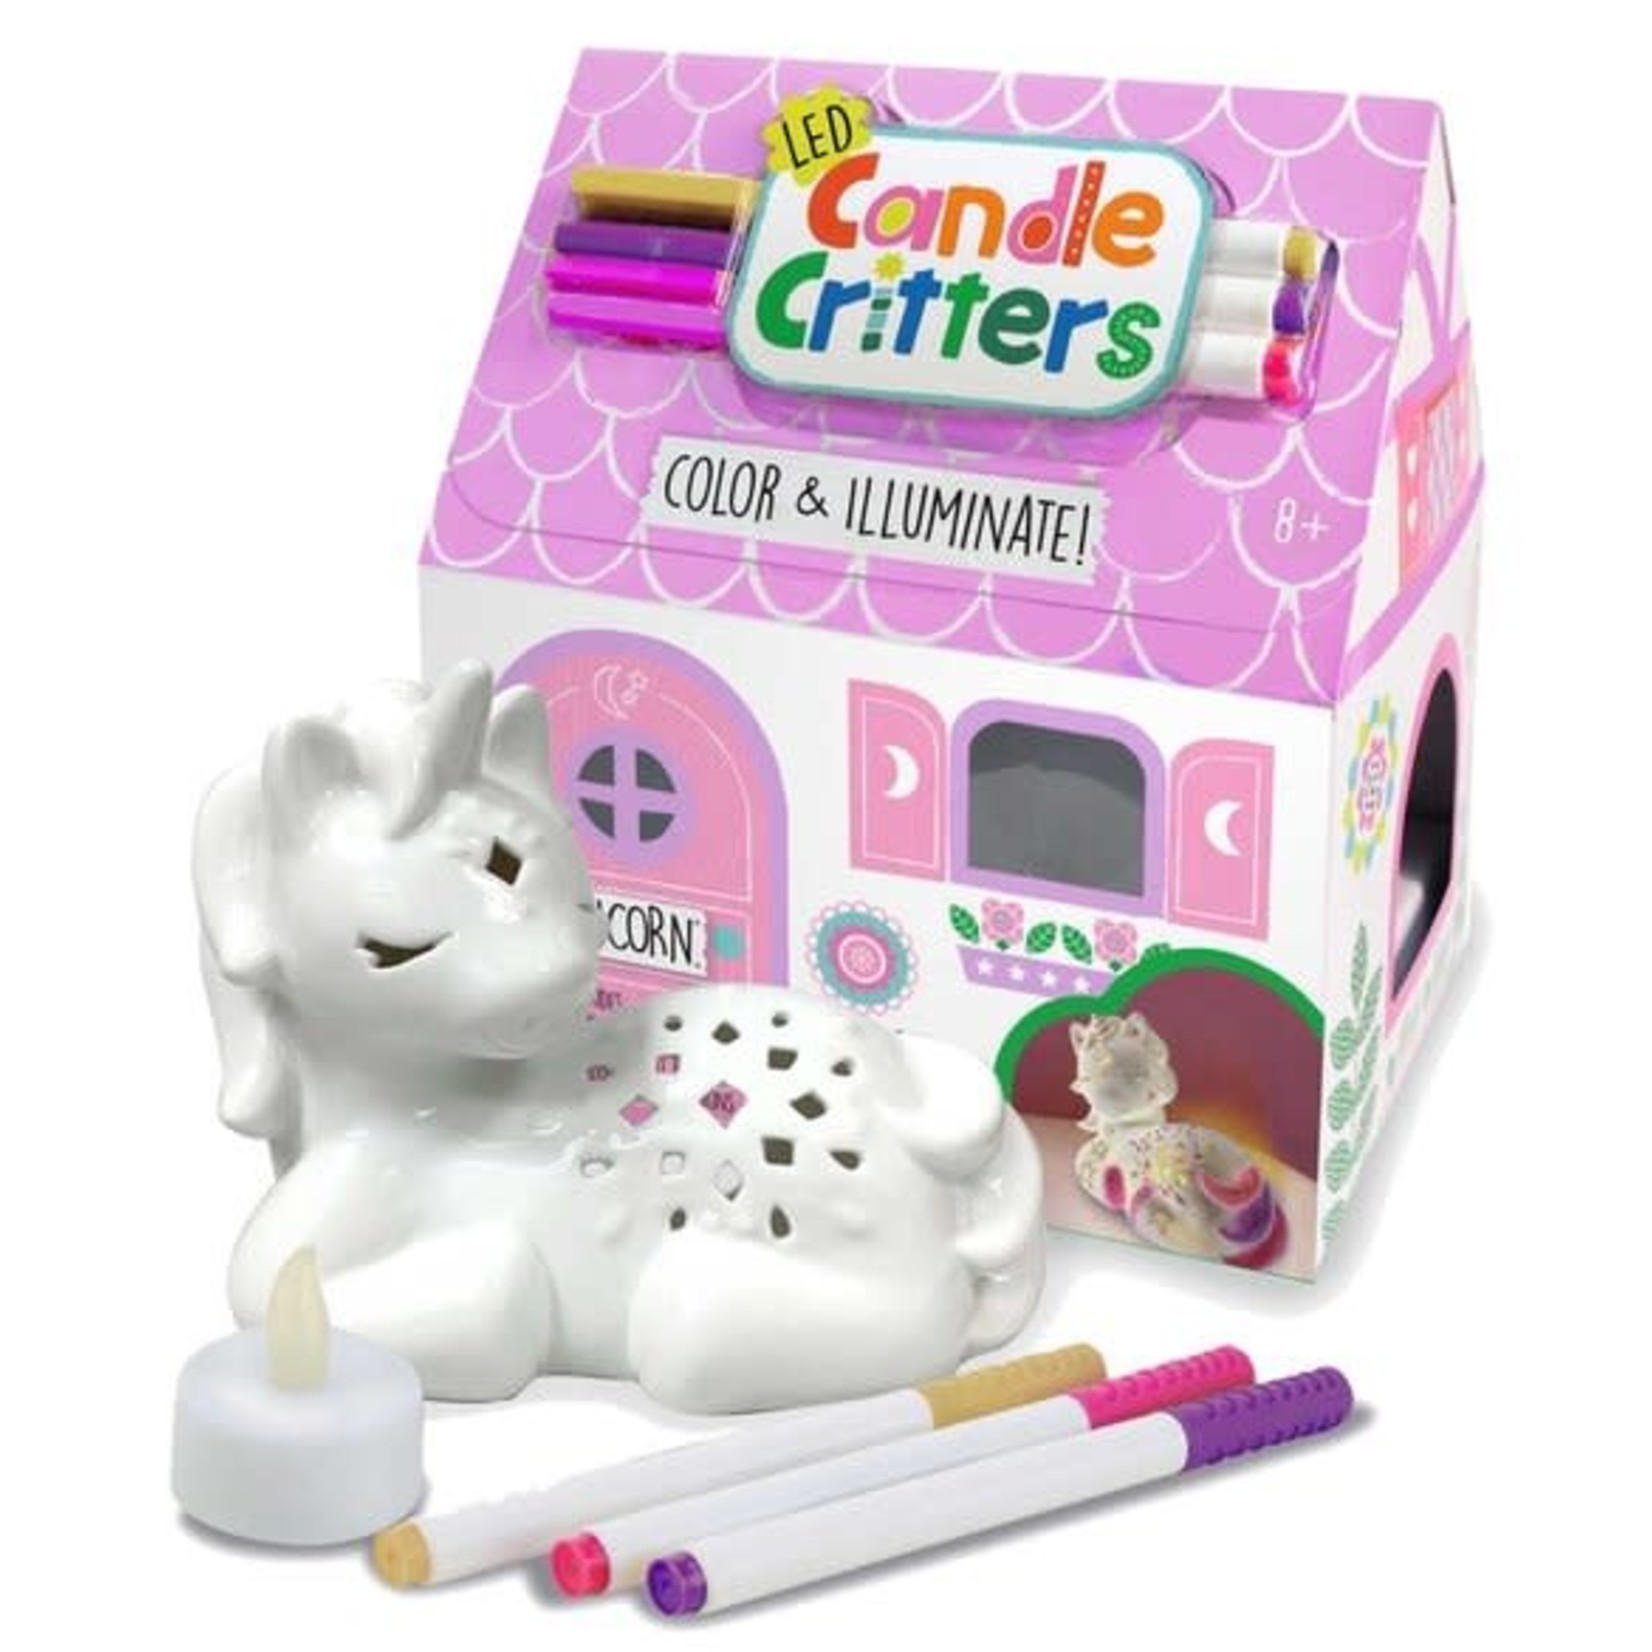 Bright Stripes LED Candle Critters: Unicorn